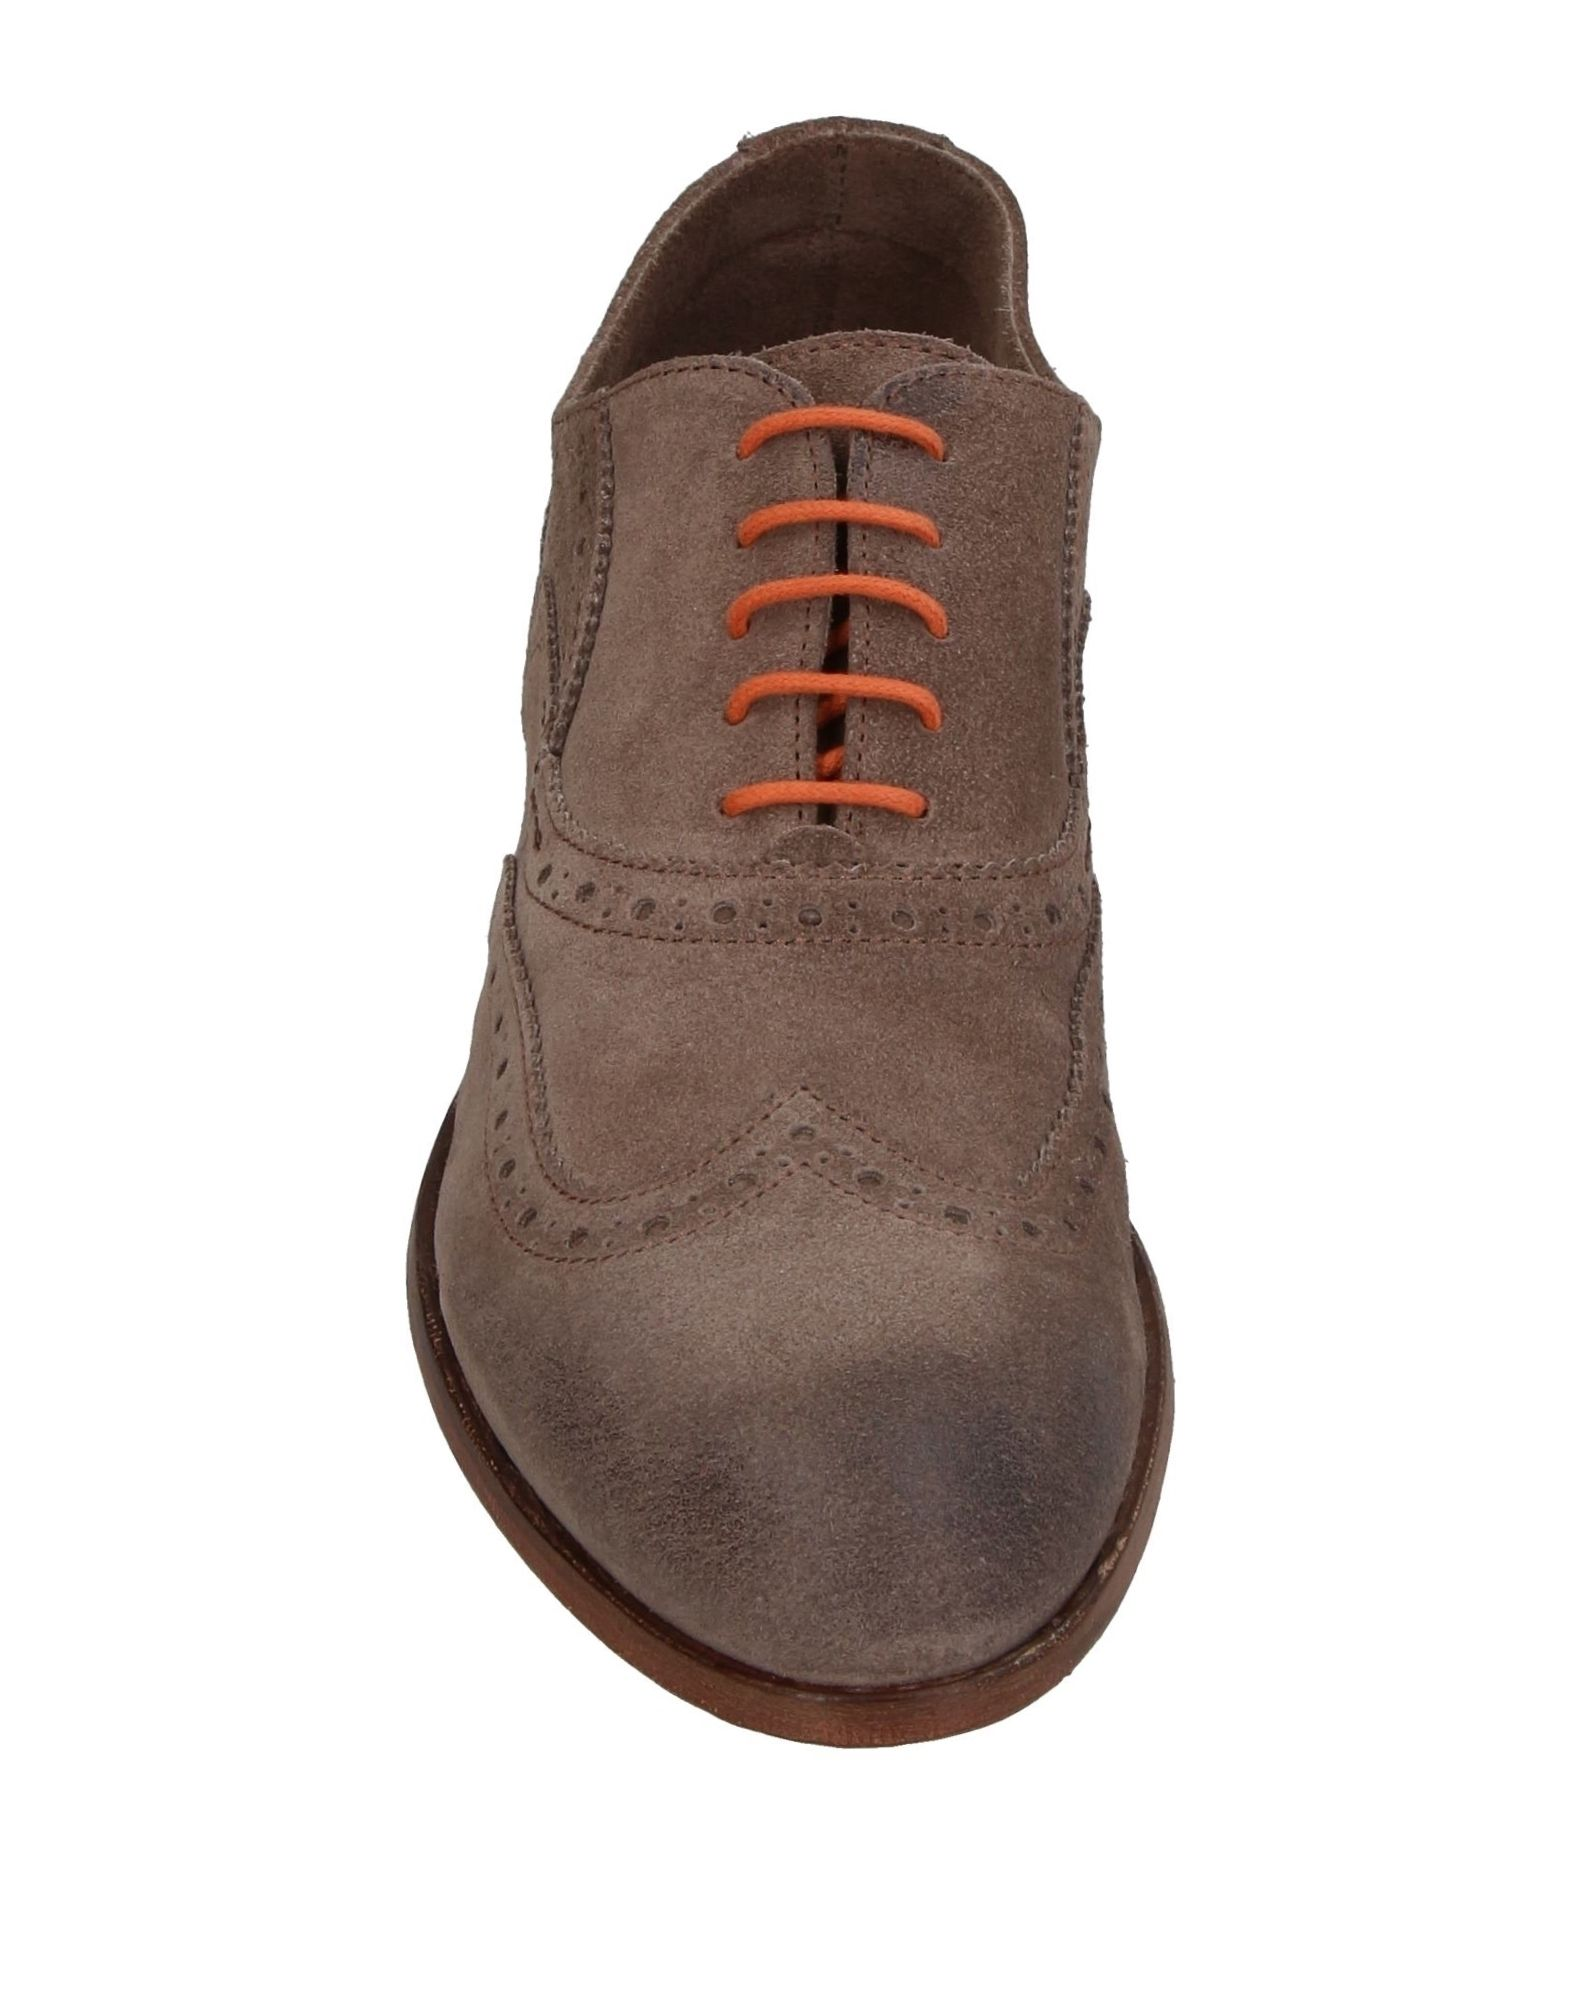 Pawelk's Schuhe Schnürschuhe Herren  11398409BA Heiße Schuhe Pawelk's a63e05